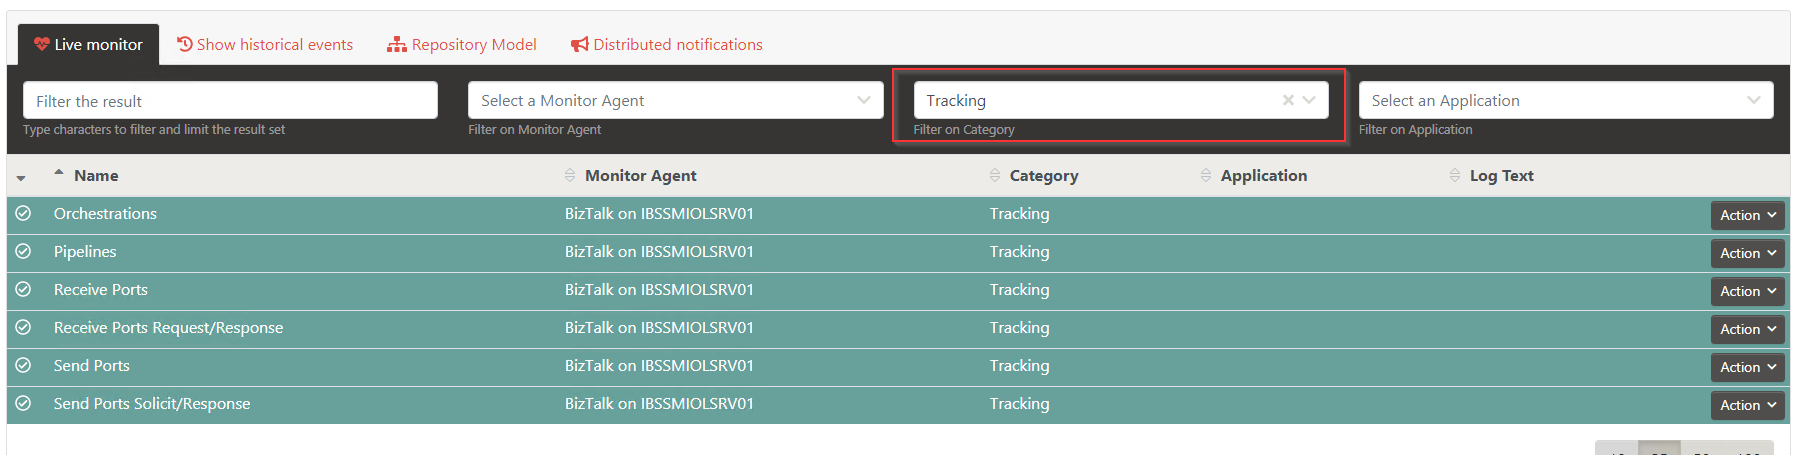 TrackingResources